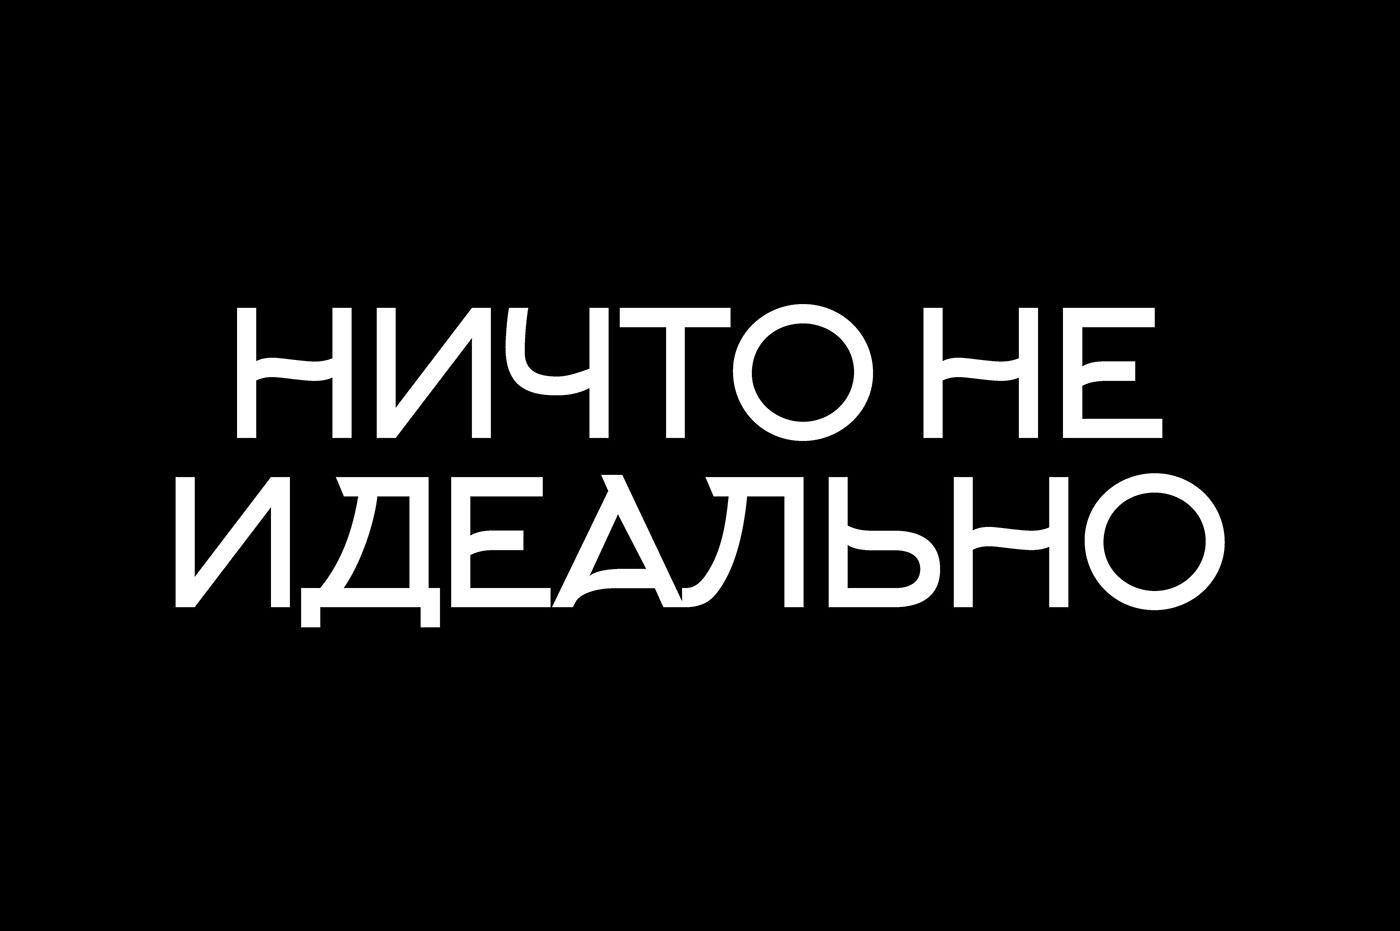 Logotype free freefont Typeface motion Cyrillic poster logo print identity photoshop brand